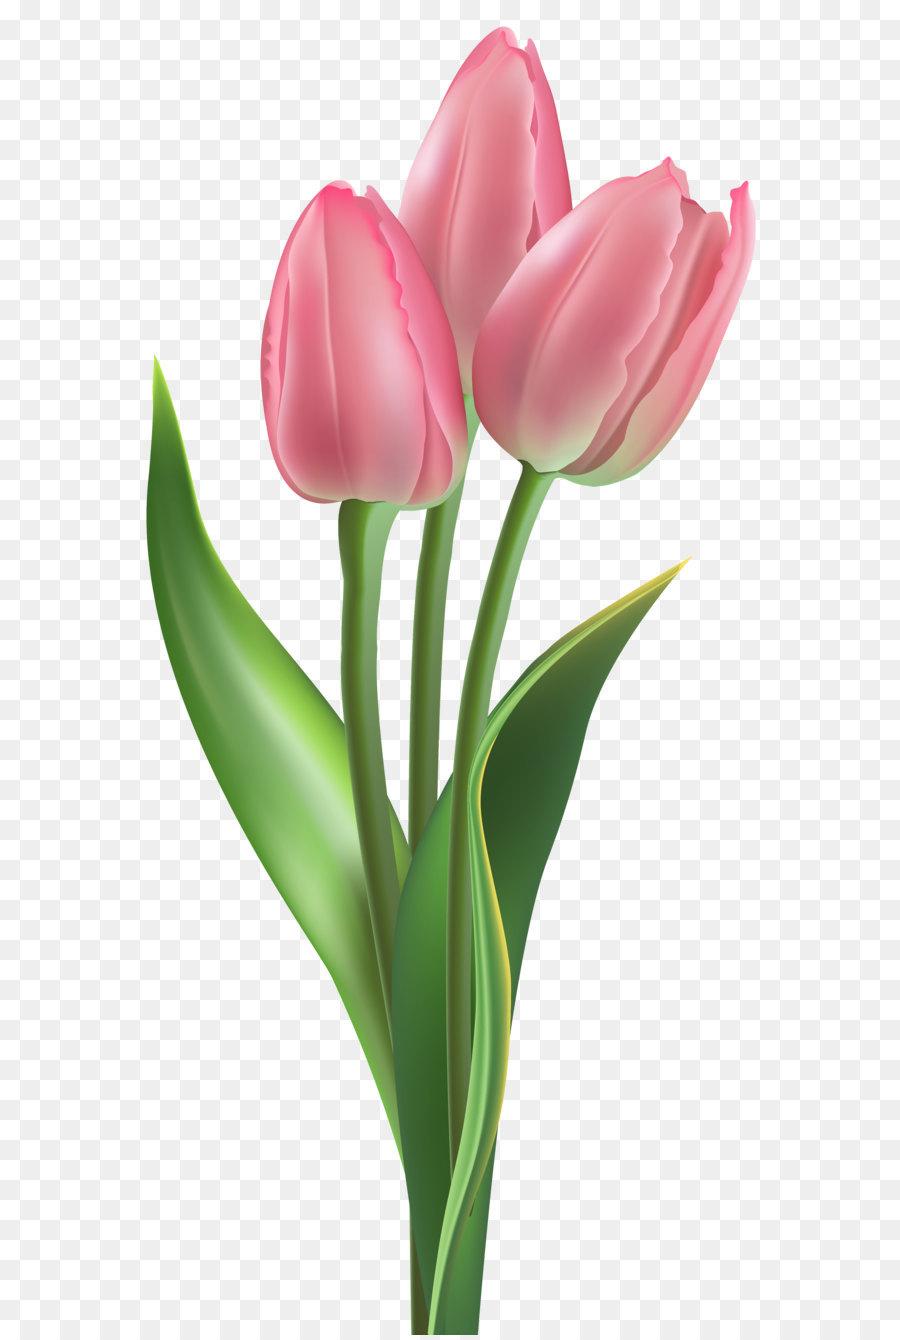 Tulip flower pink clip art soft pink tulips png clipart image png tulip flower pink clip art soft pink tulips png clipart image mightylinksfo